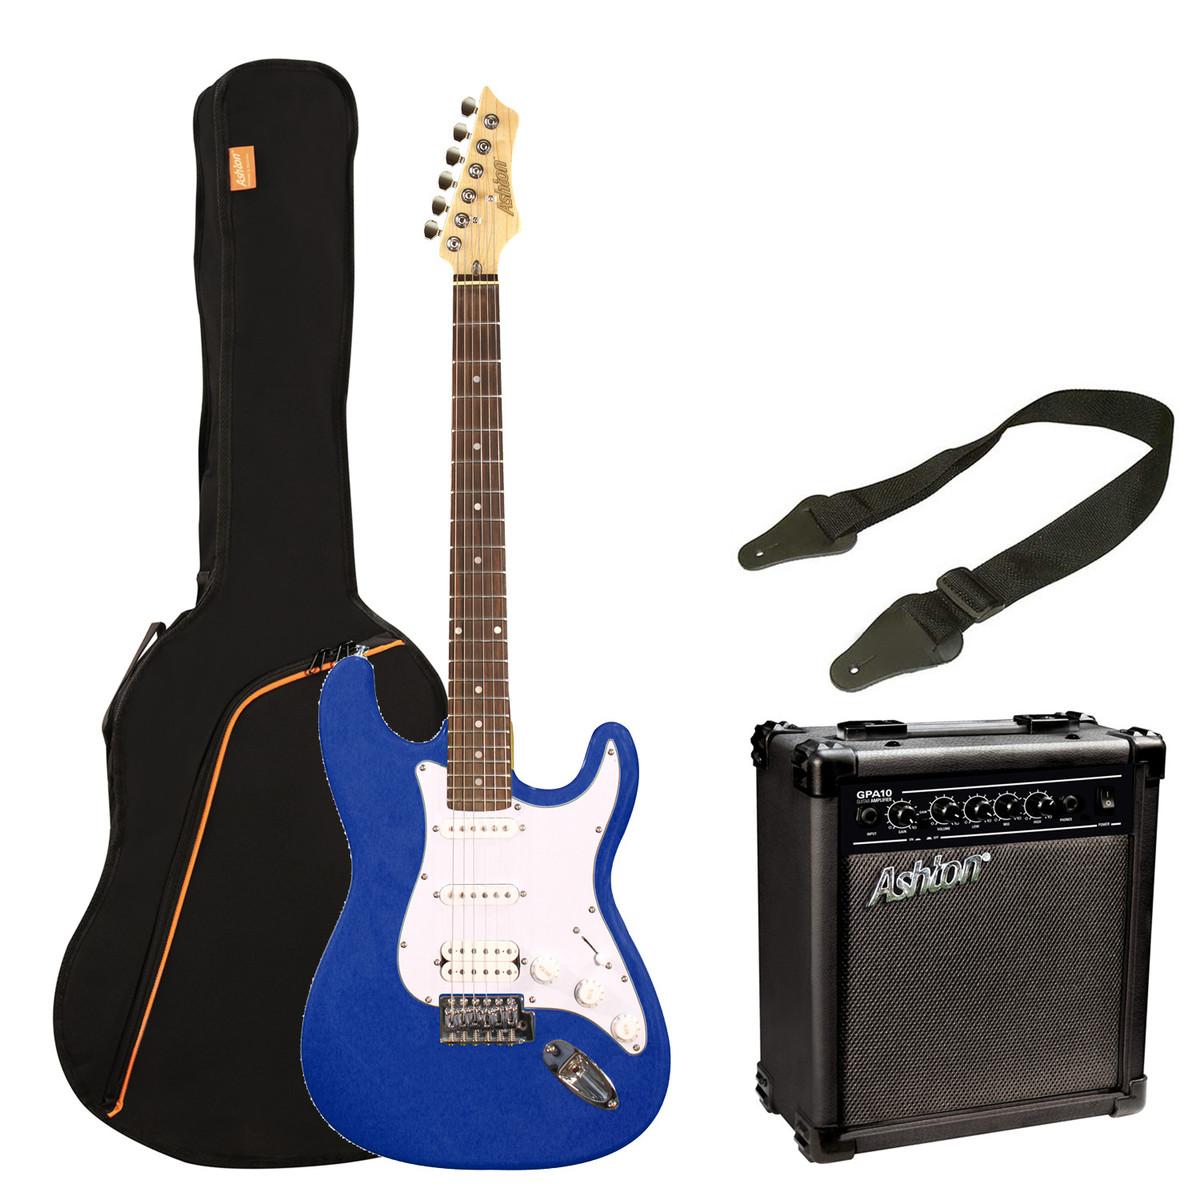 Electric Guitar Packs Good : ashton spag232 electric guitar starter pack transparent dark blue at ~ Russianpoet.info Haus und Dekorationen